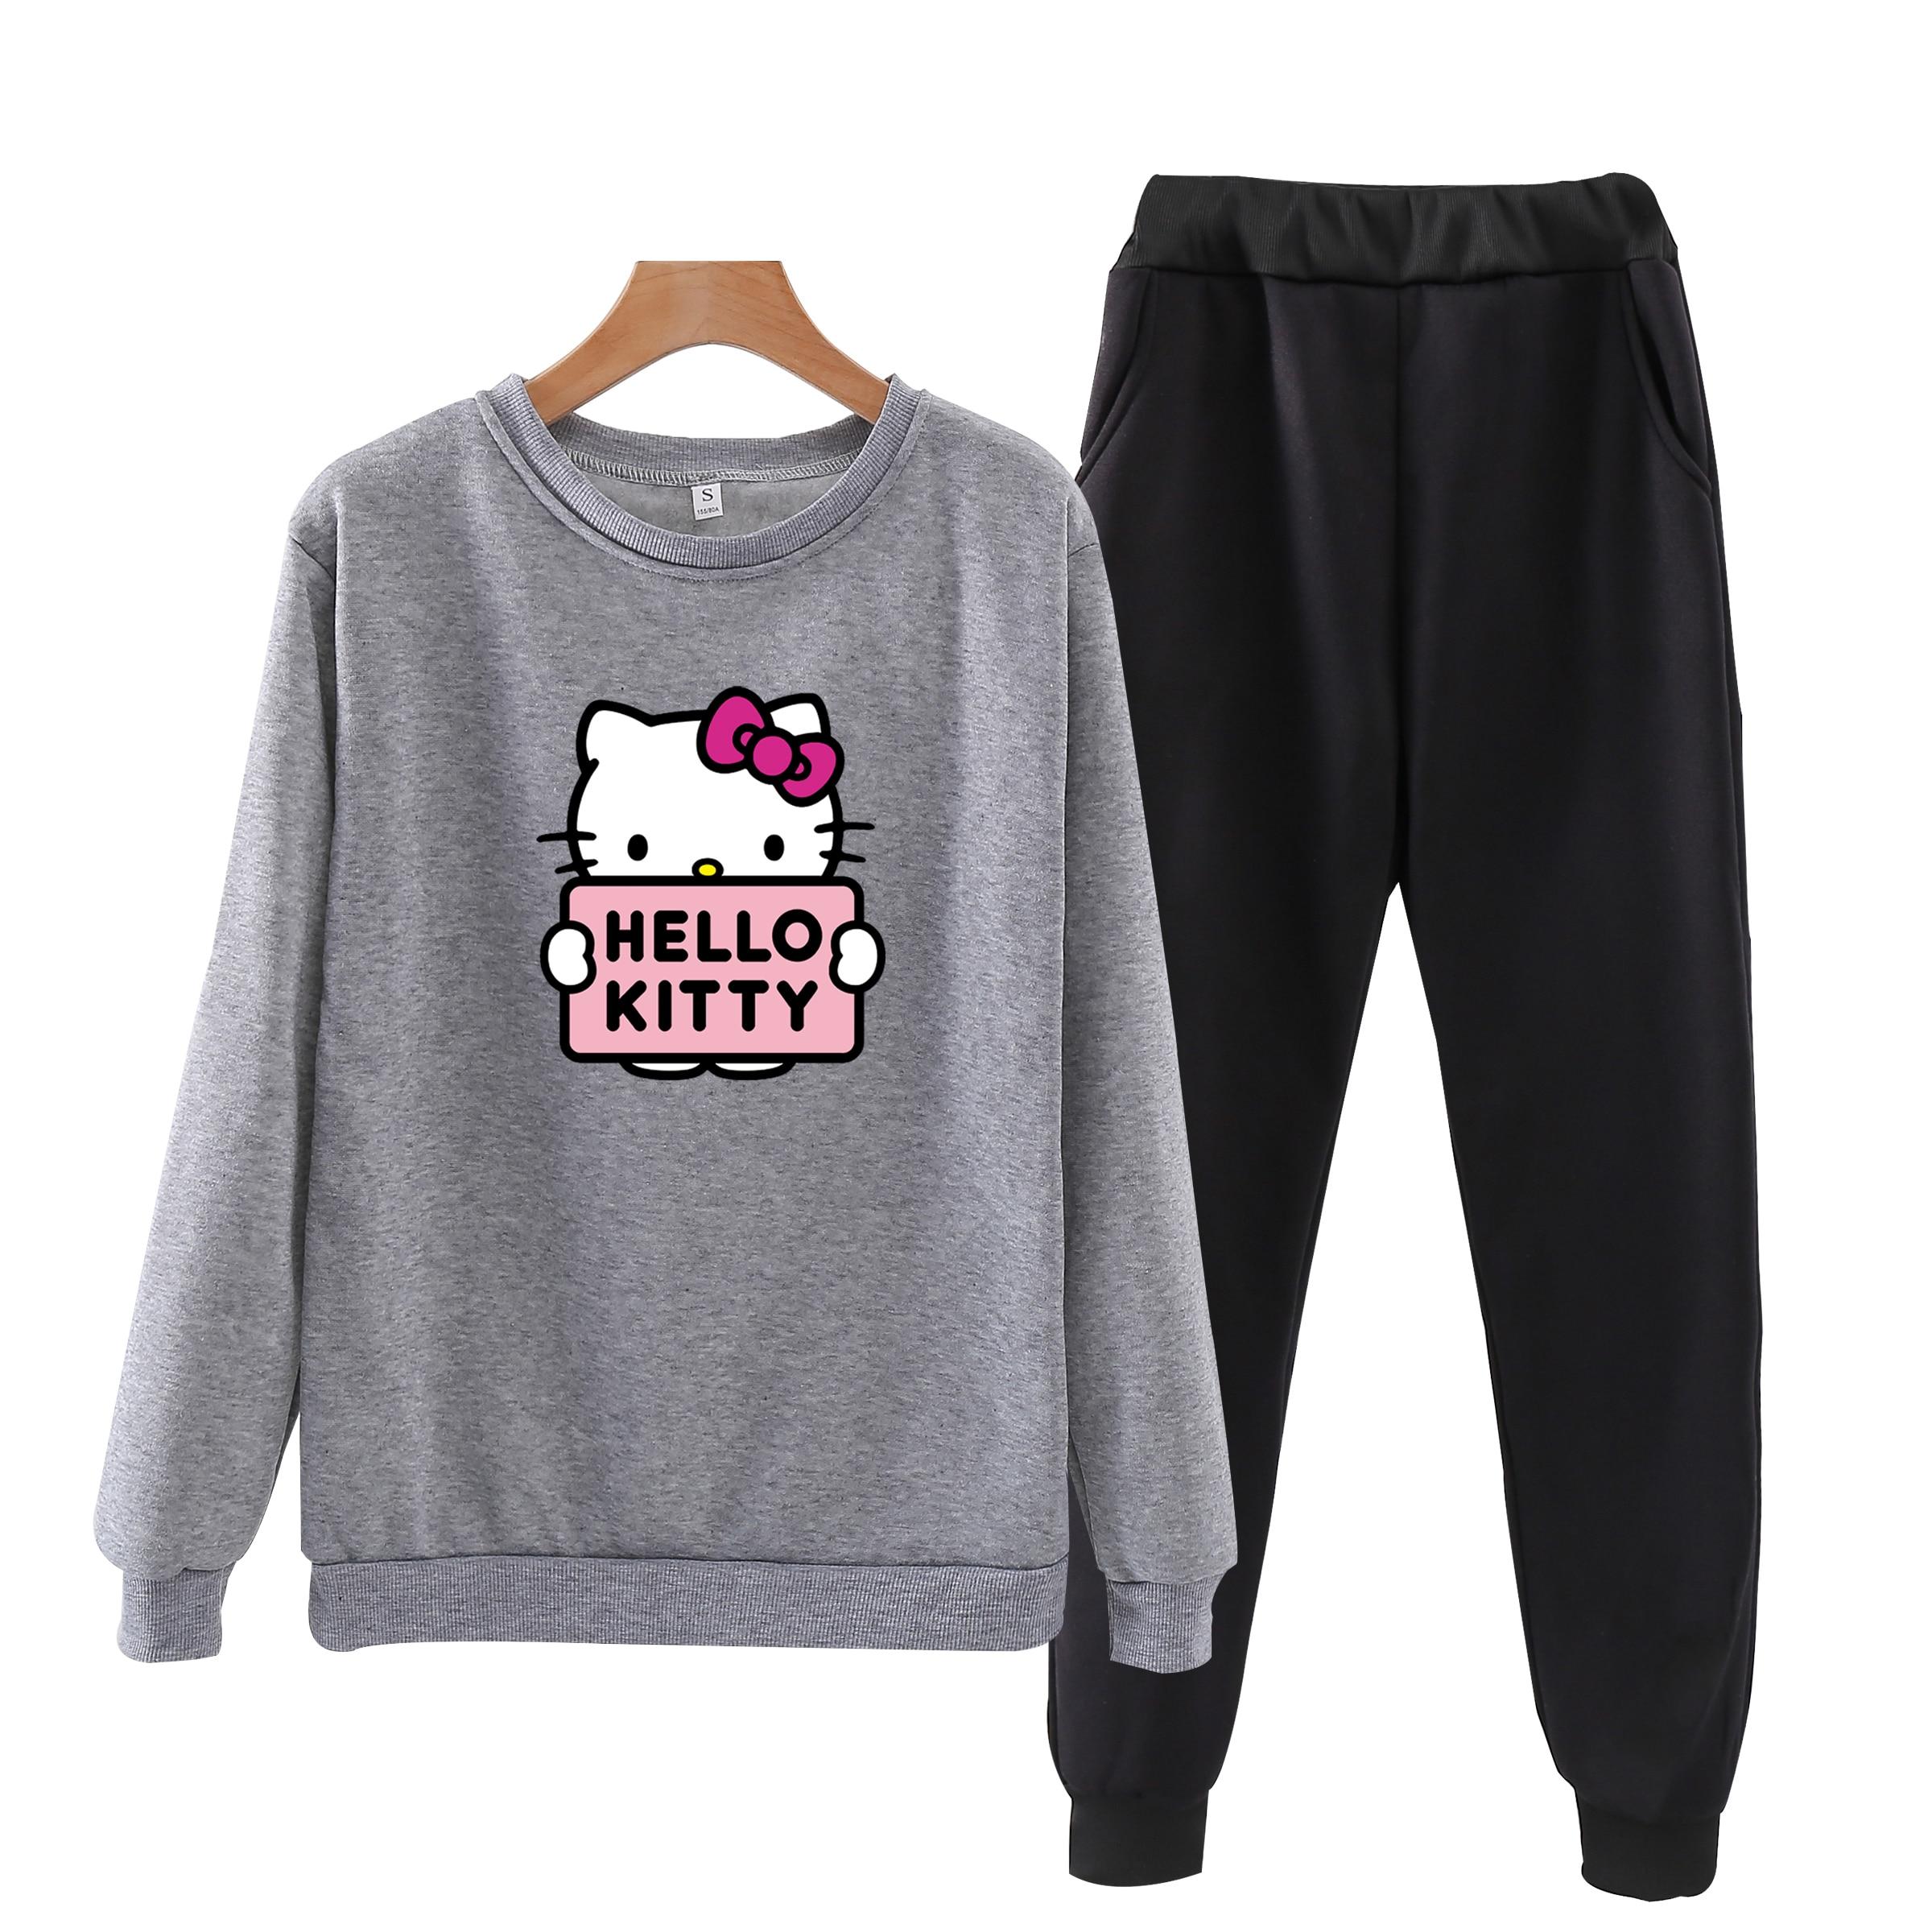 P106 Hello-kitty Autumn Tracksuit Long Sleeve Sweatshirts 2 Piece Set Casual Sport Suit Women Tracksuit Set